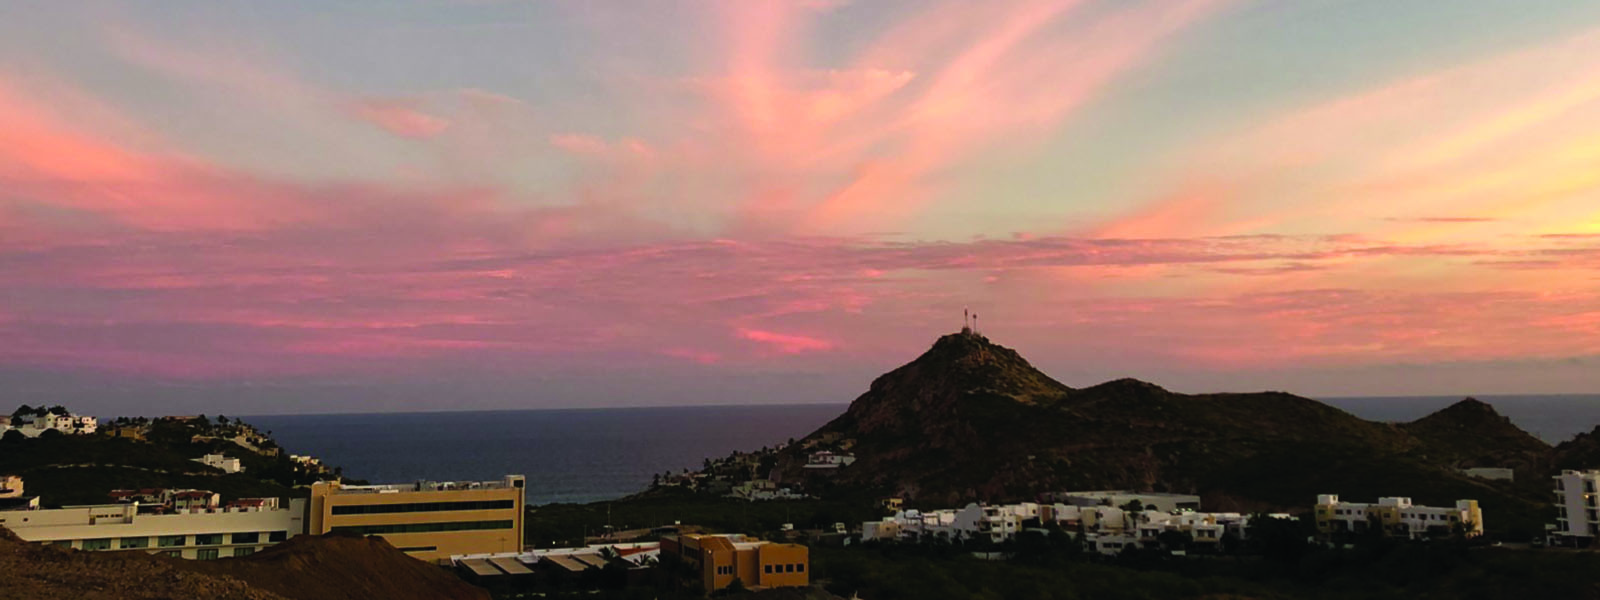 Condos Houses in Baja California Sur Mexico | Ladera San Jose | Gated